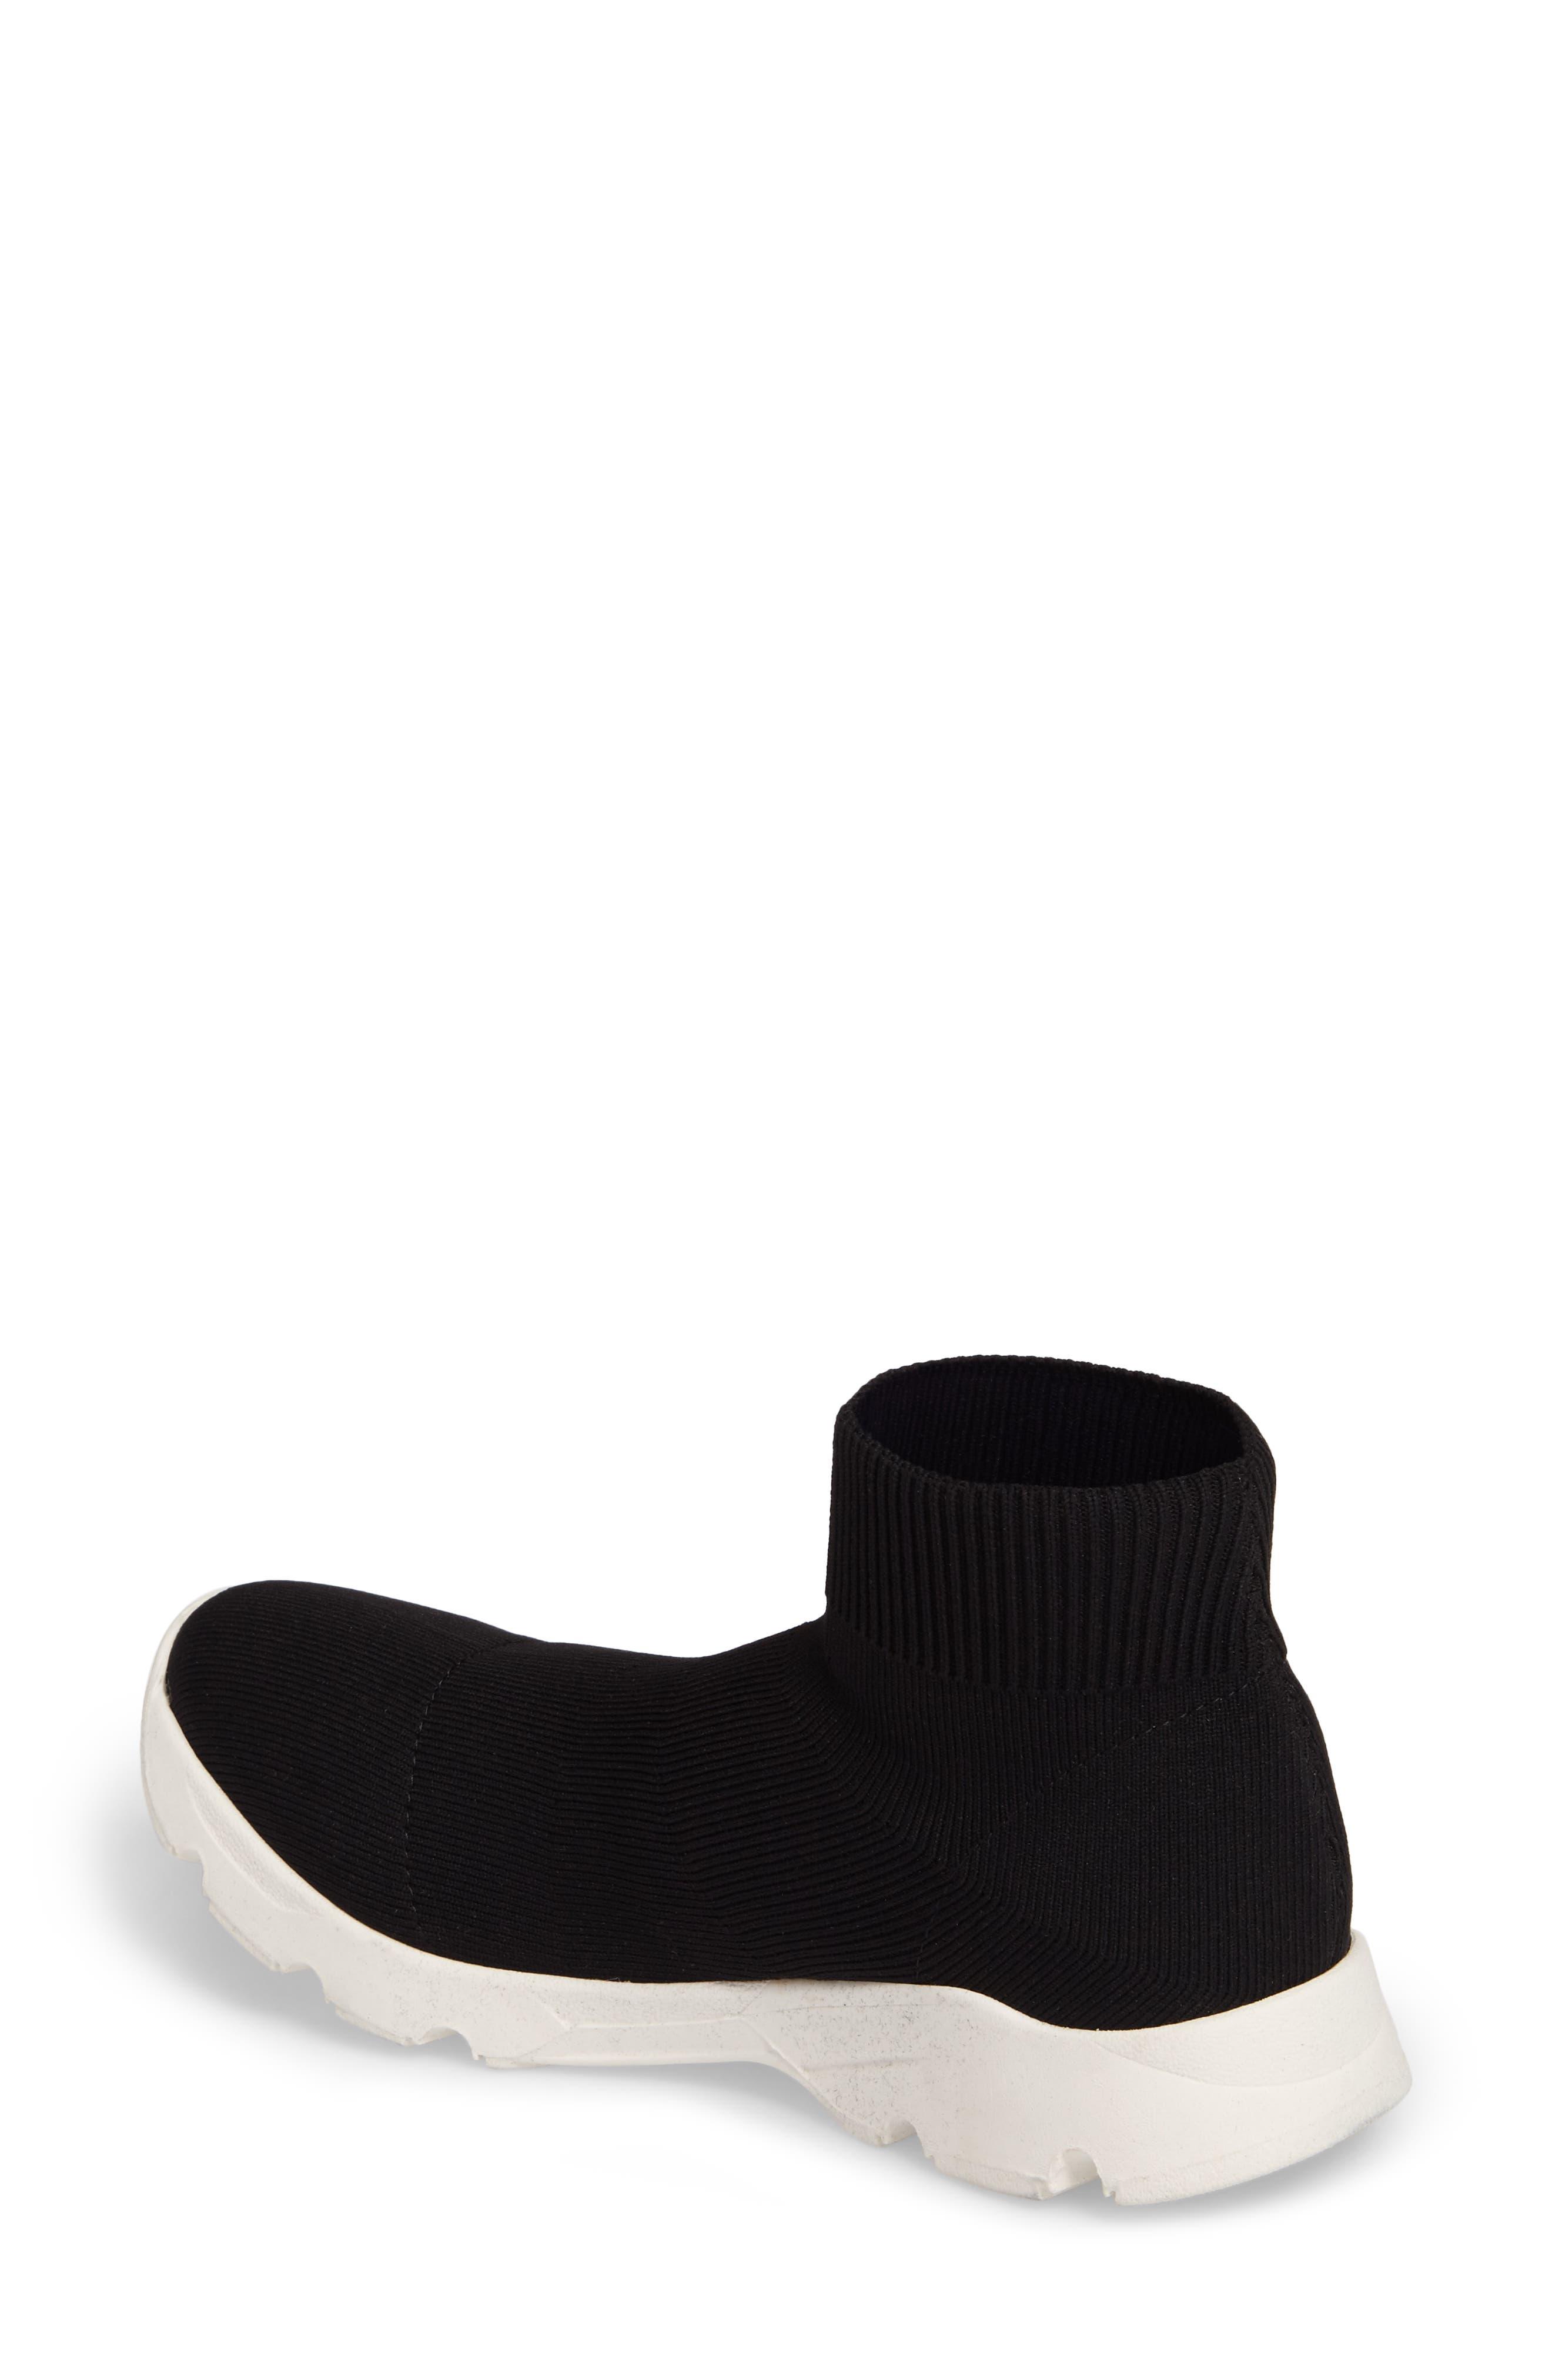 Winston Knit High Top Sneaker,                             Alternate thumbnail 2, color,                             001